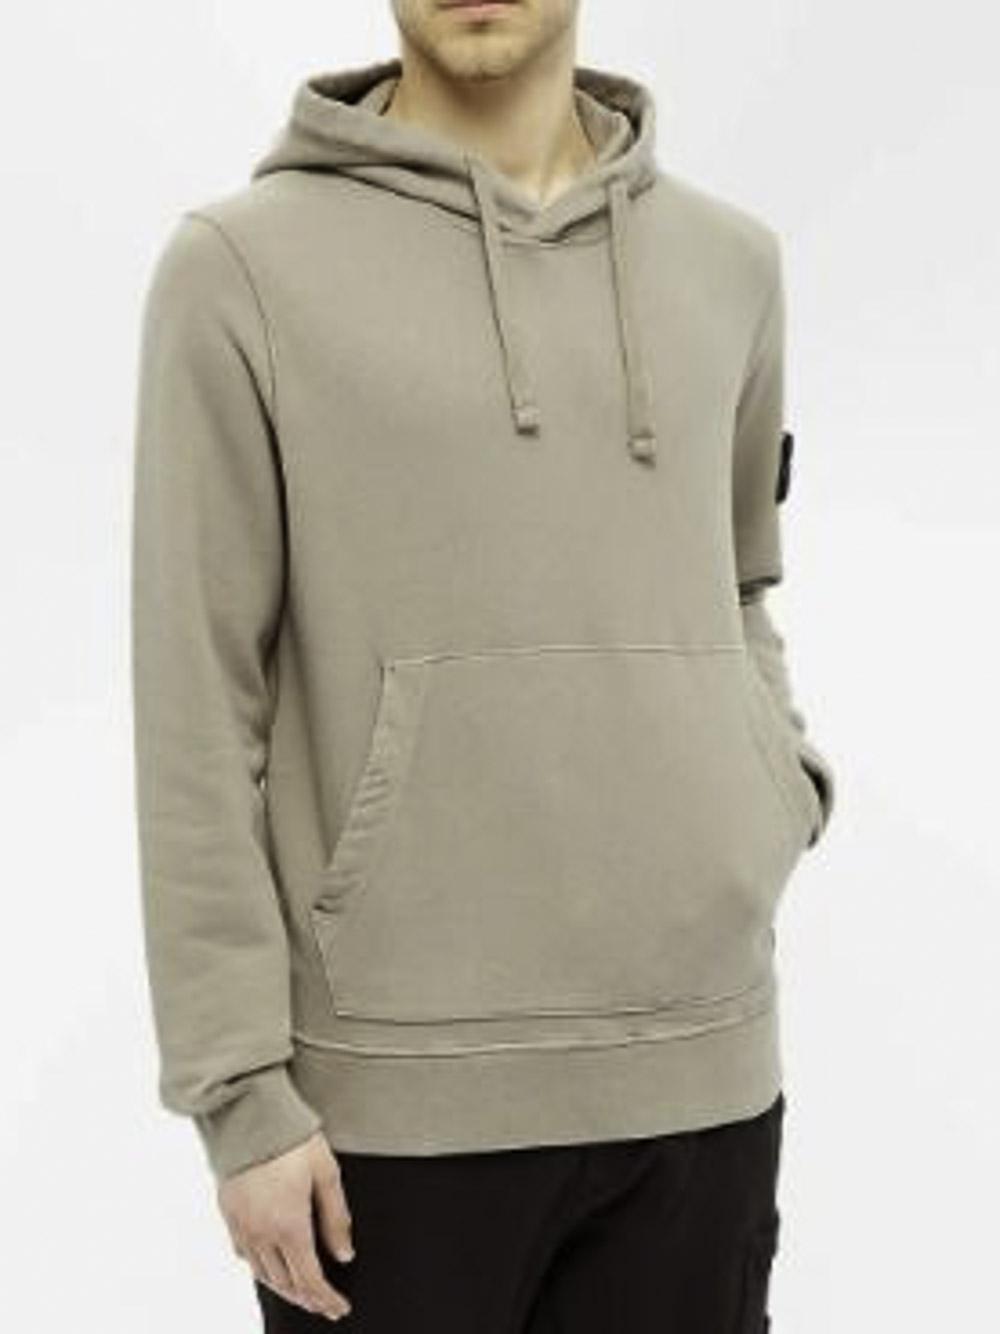 STONE ISLAND Μπλούζα φούτερ με κουκούλα MO731564120-V0068 ΜΠΕΖ